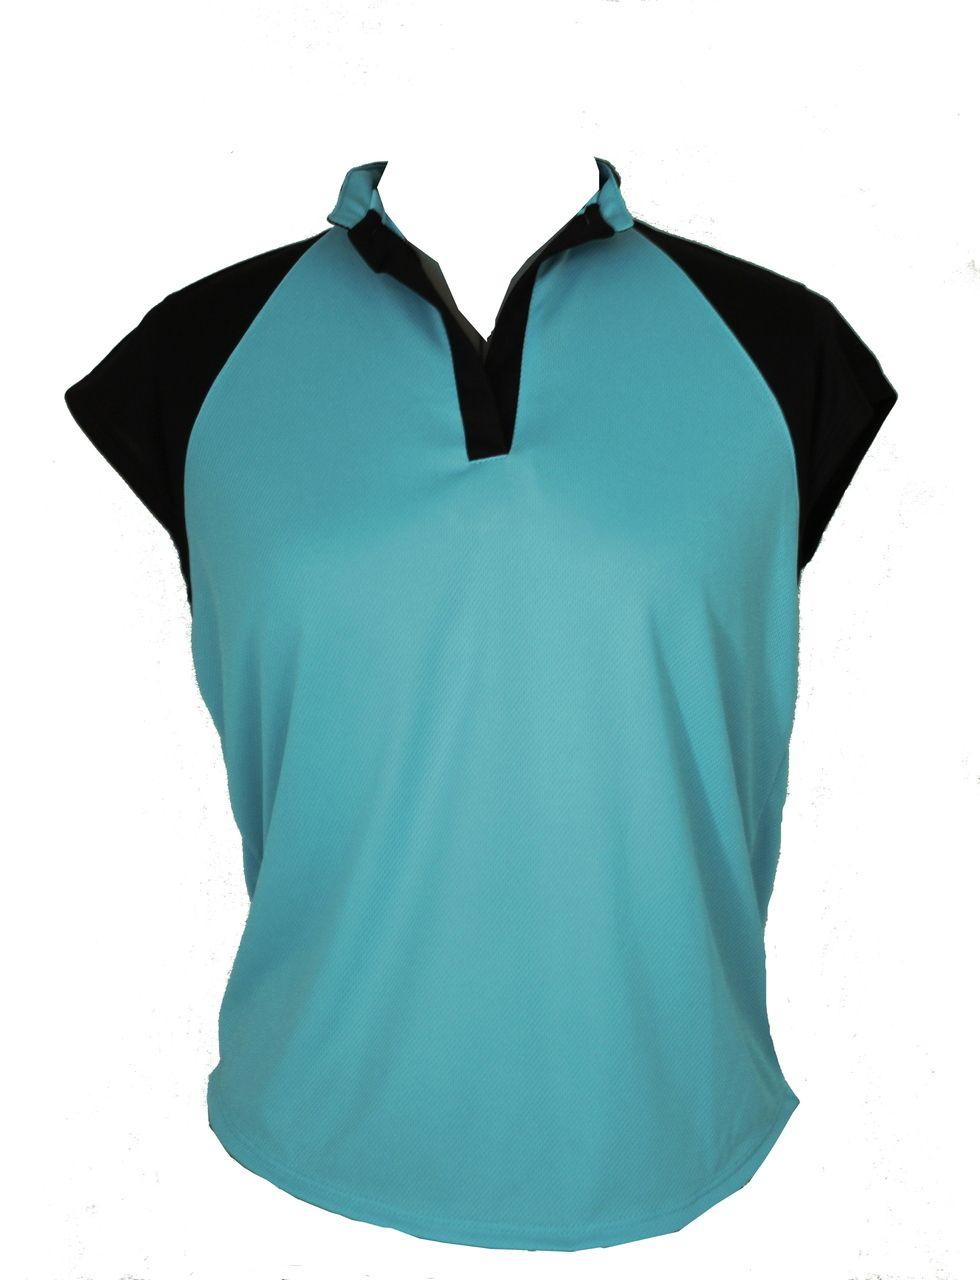 Lady Golfwear - Pastels with Black  Raglan Golf Shirt, $38.00, pictured here in aqua (http://www.ladygolfwear.com.au/pastels-with-black-raglan-golf-shirt/)